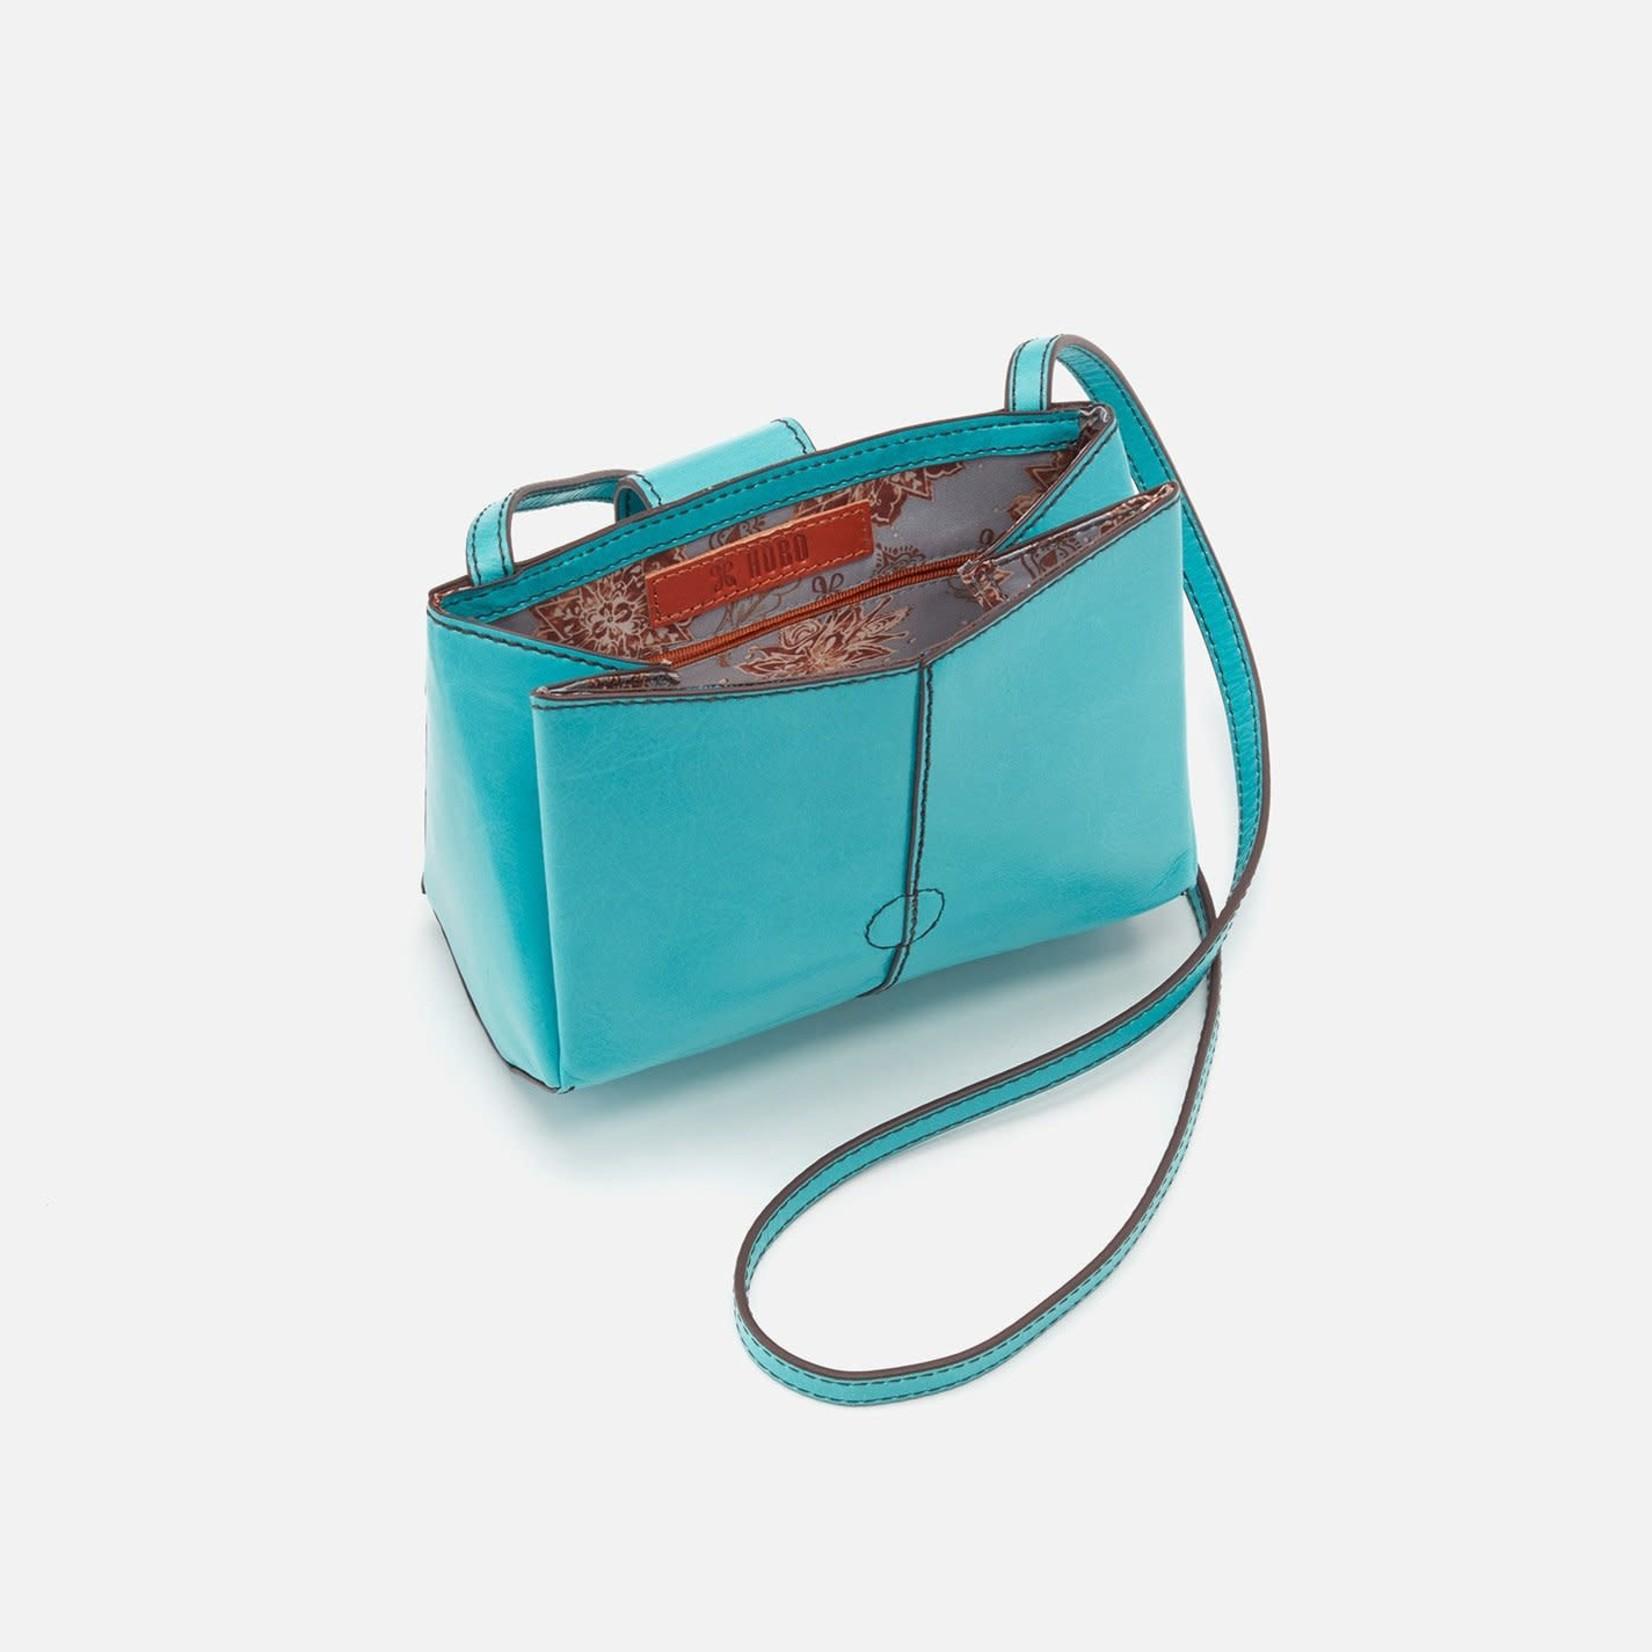 HOBO Elan Aqua Vintage Hide Leather Crossbody